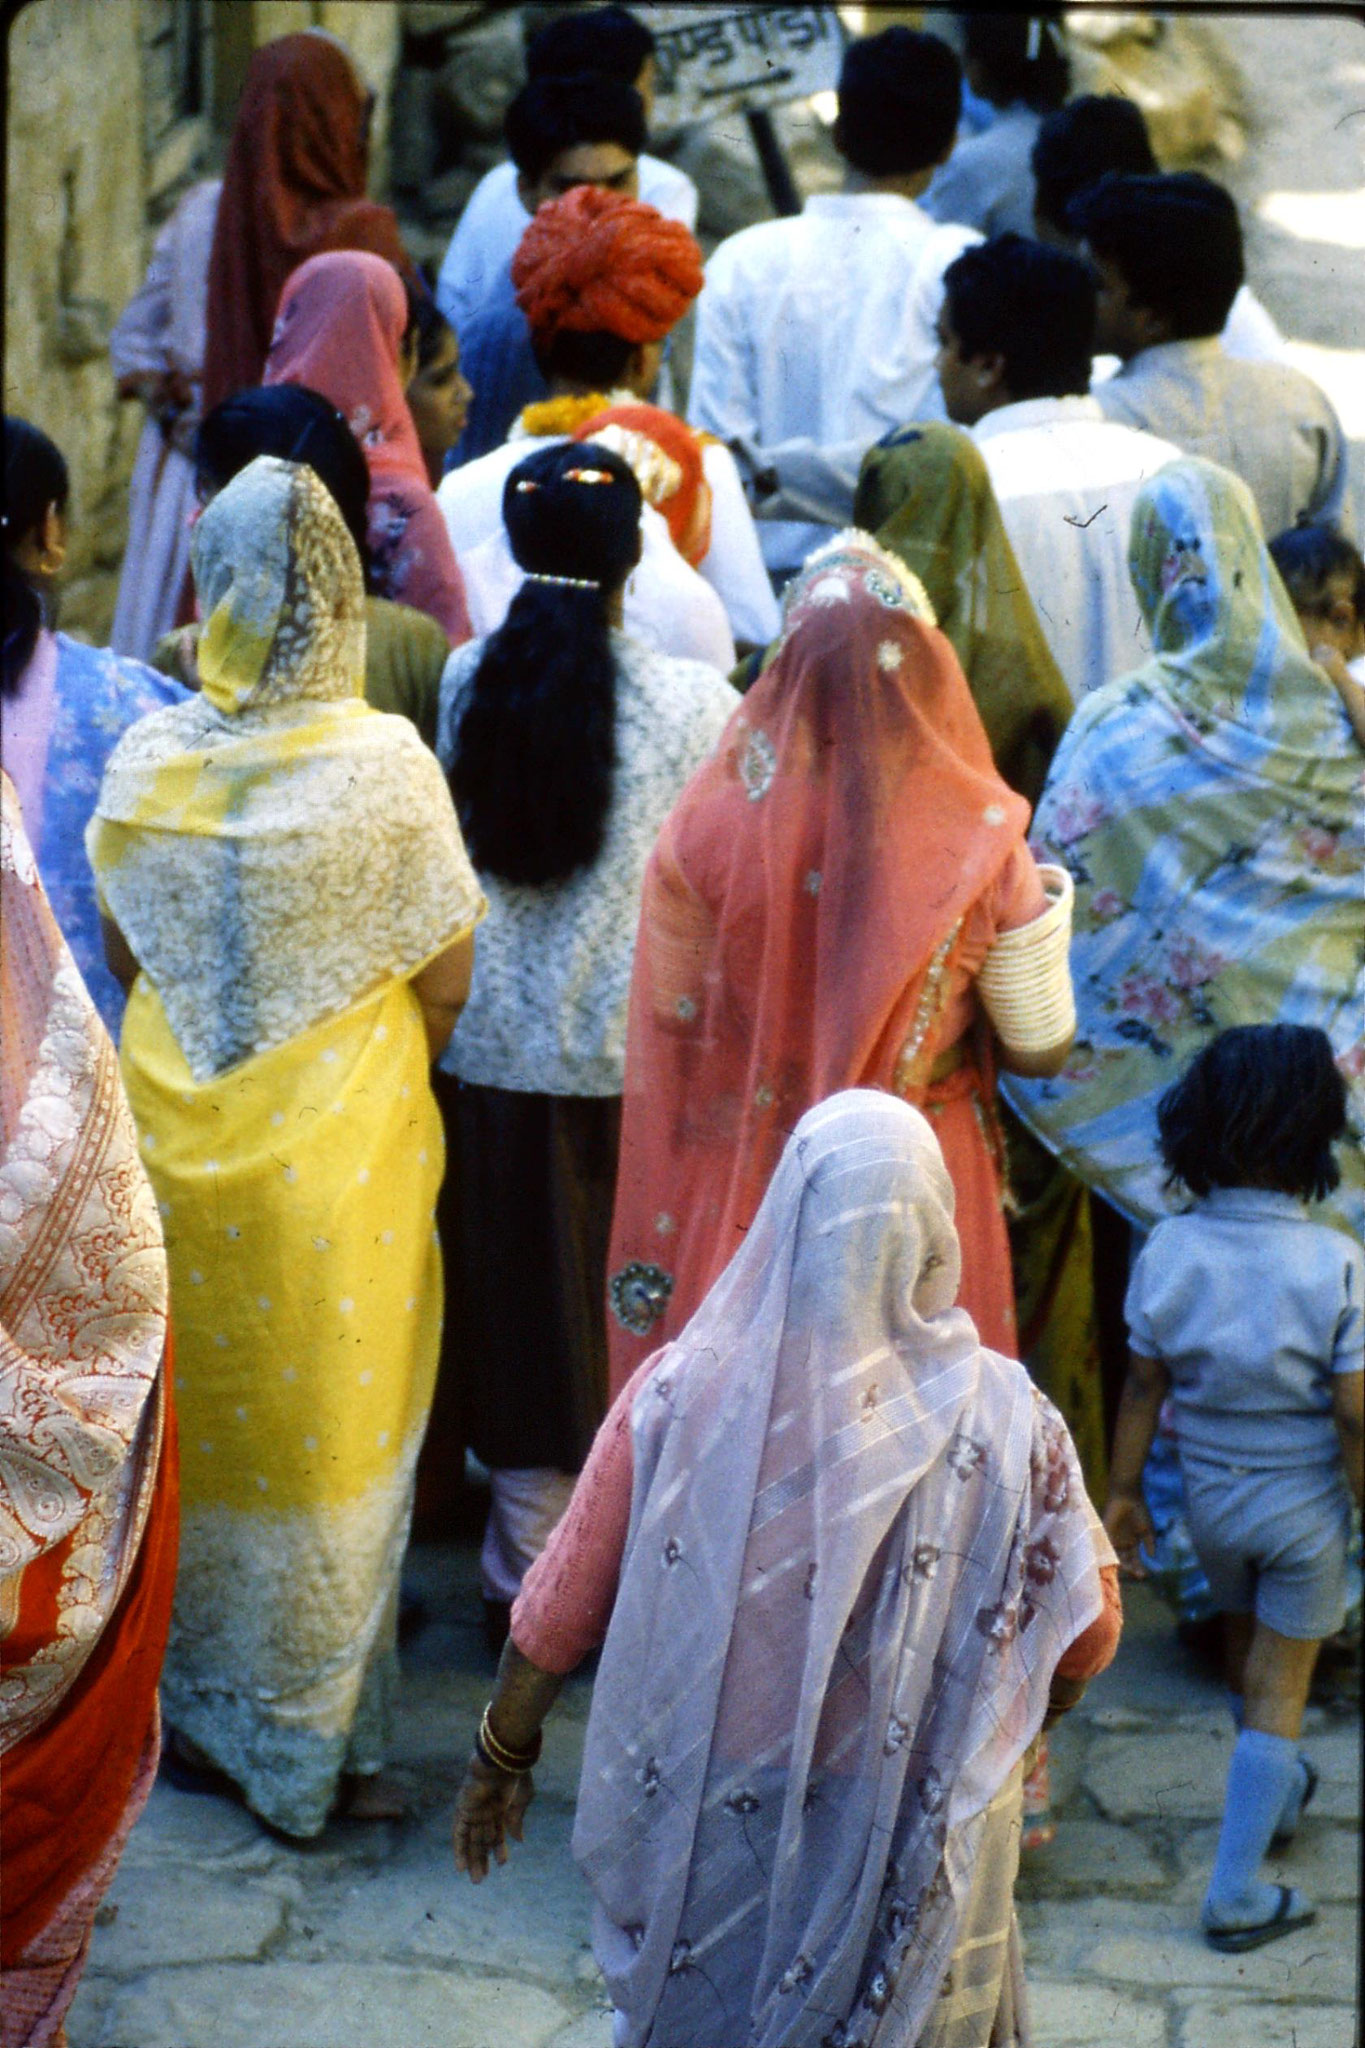 3/12/1989: 4: Jaisalmer wedding procession